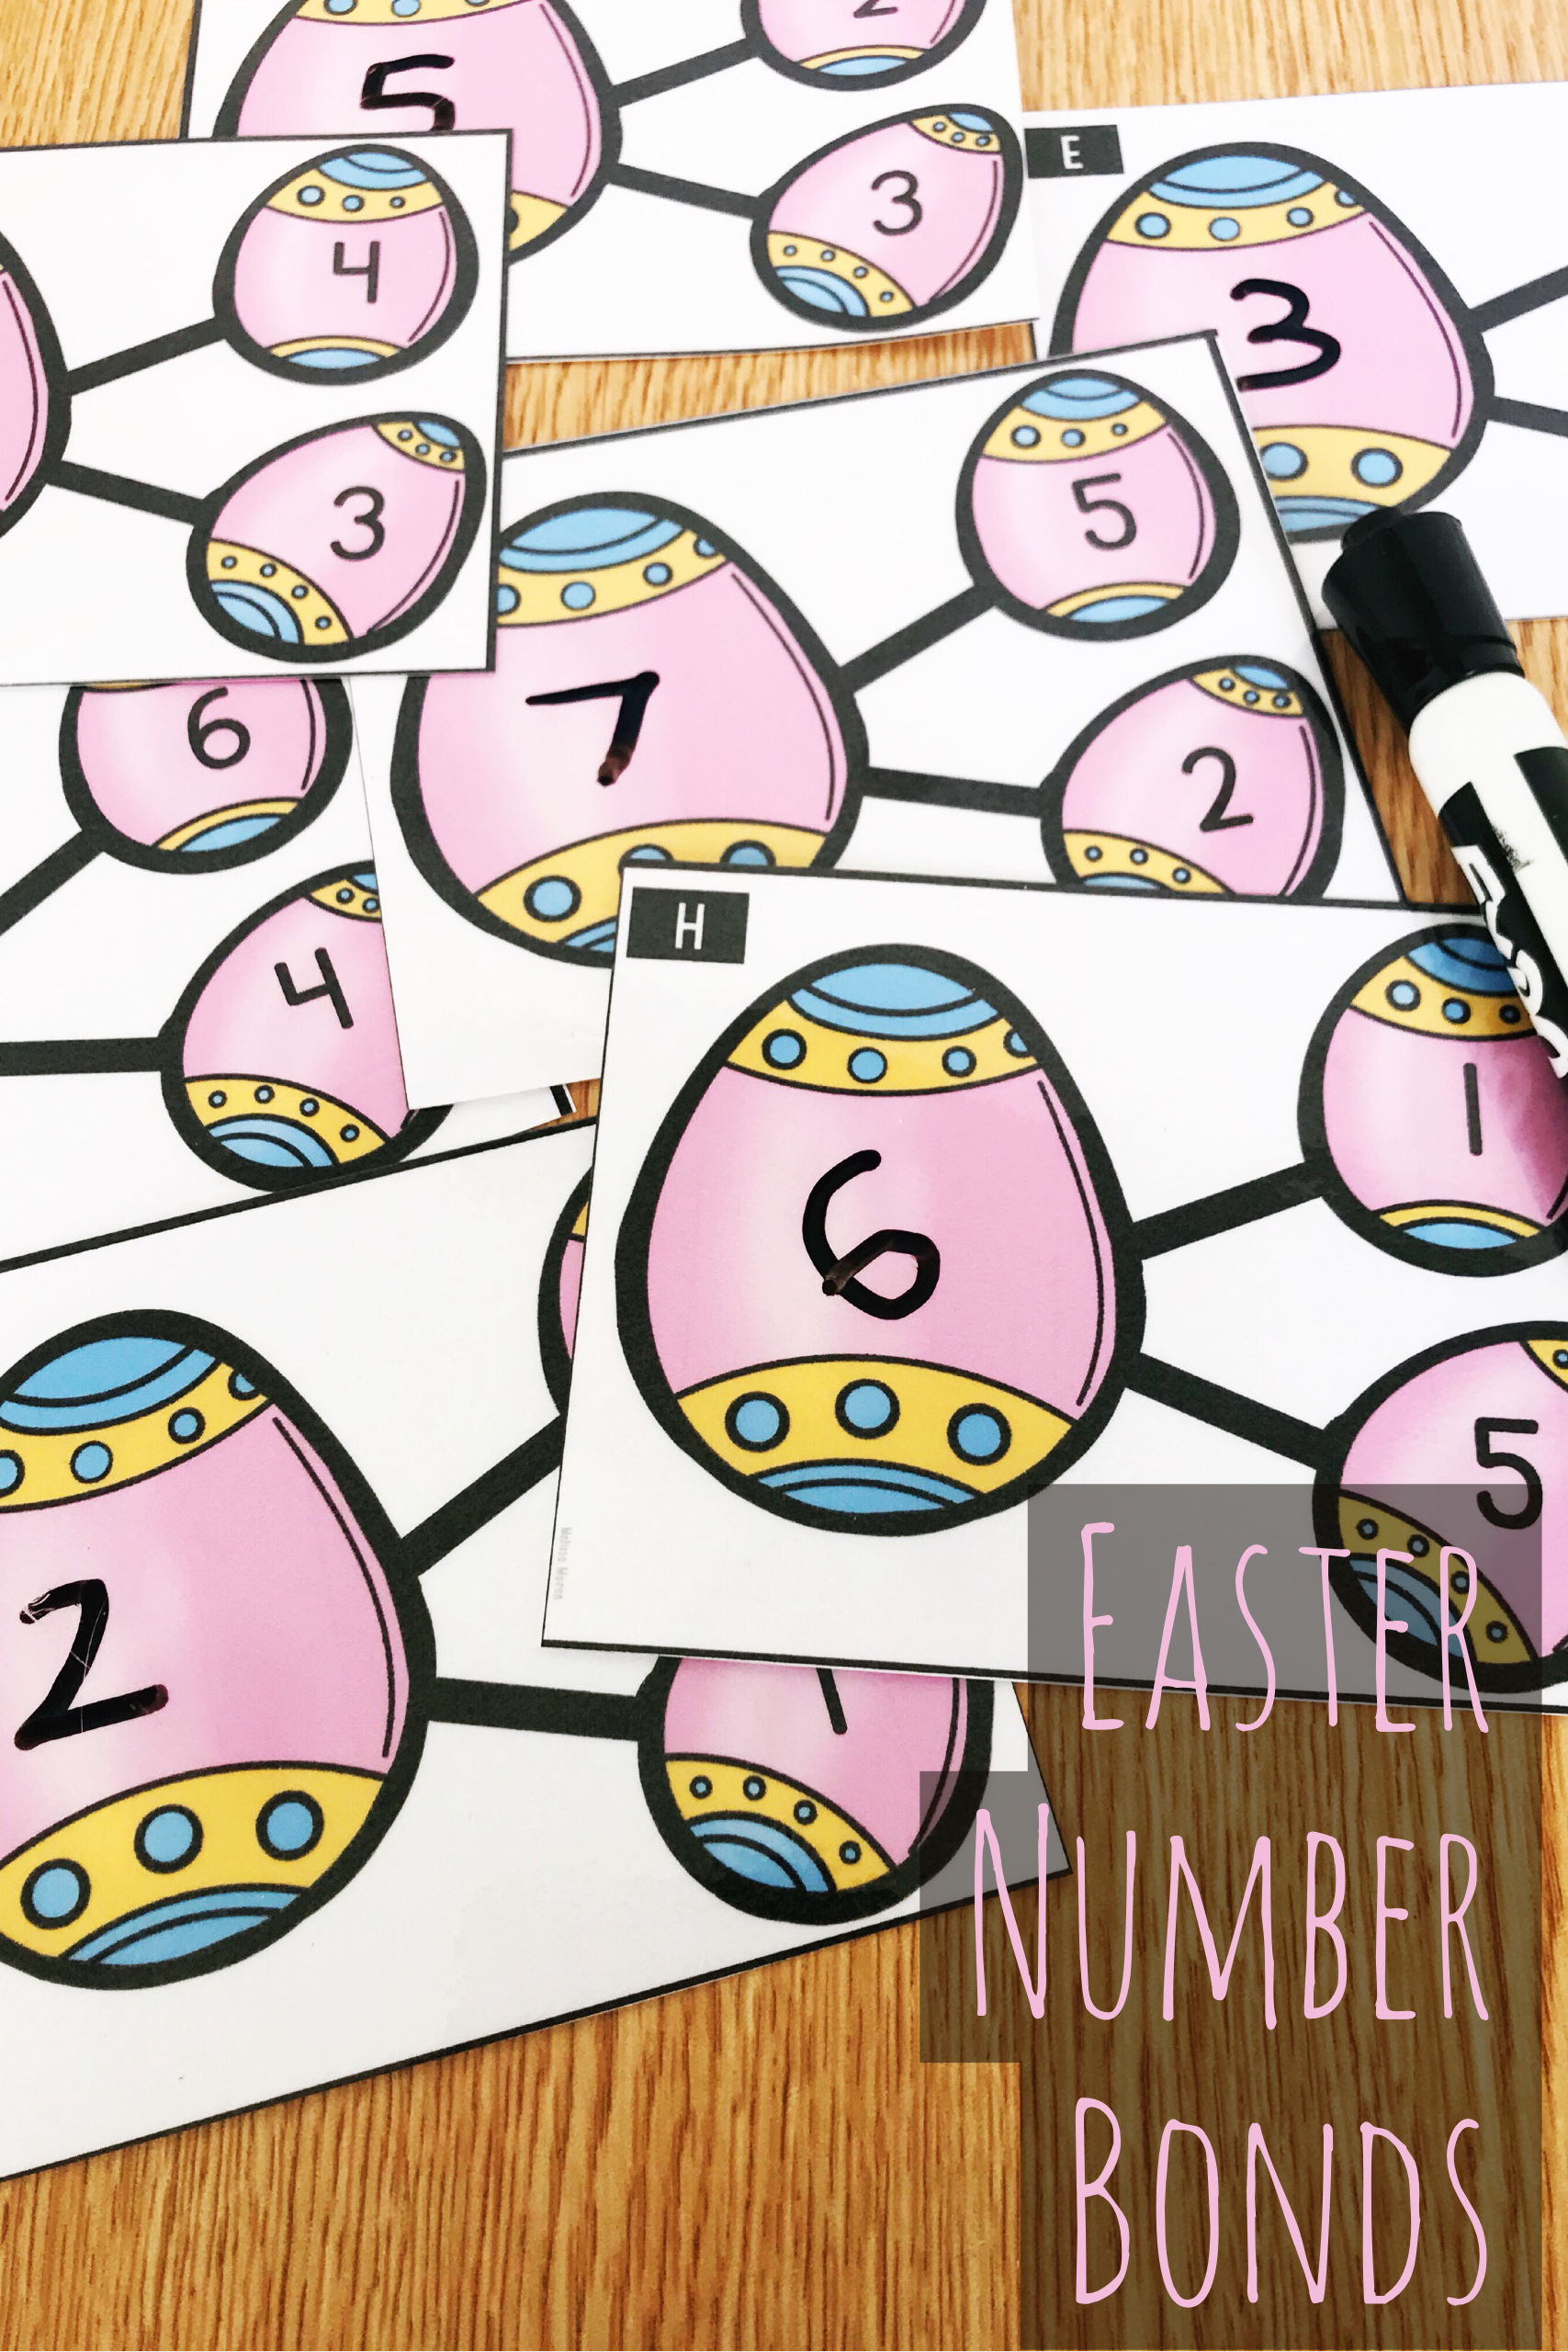 Kindergarten Easter Number Bonds